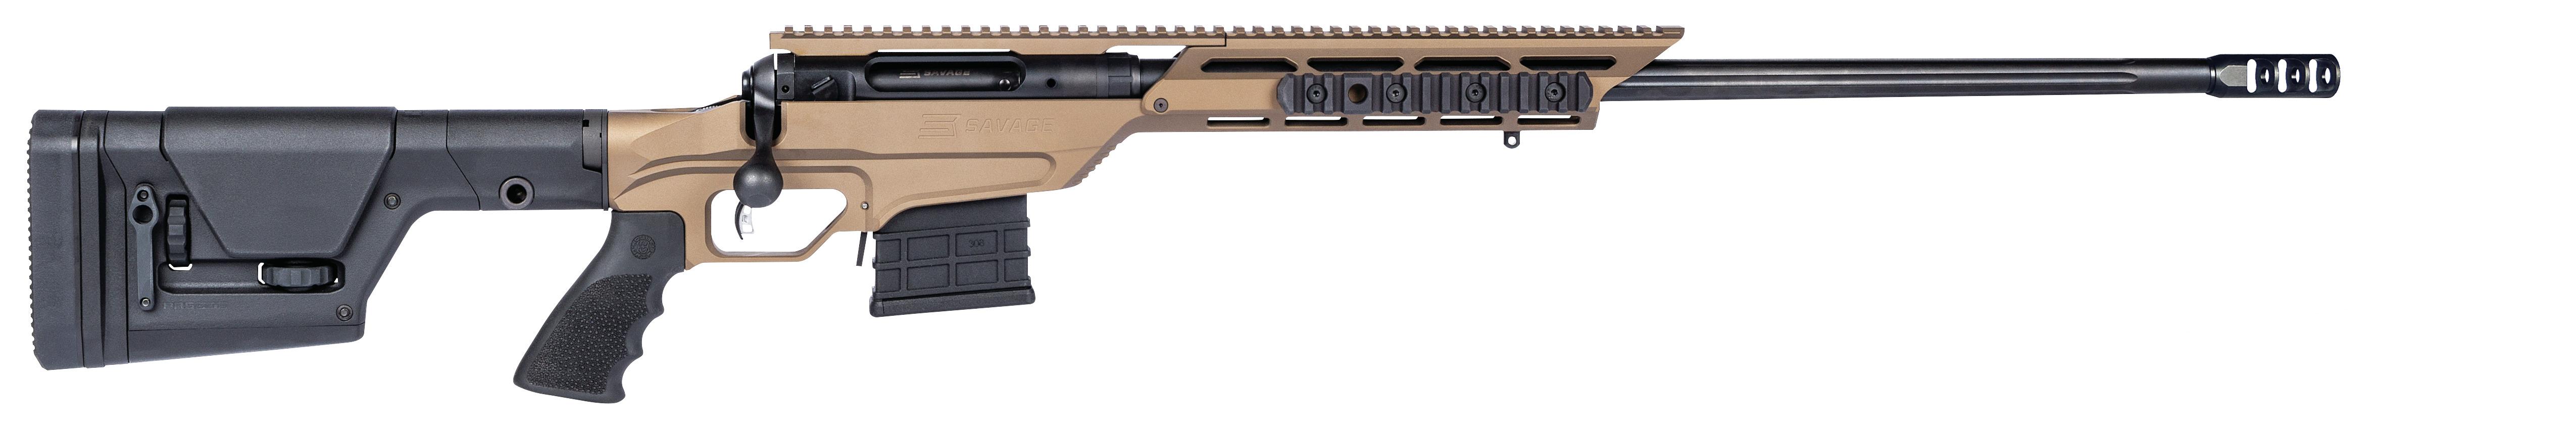 Model 10/110 Stealth